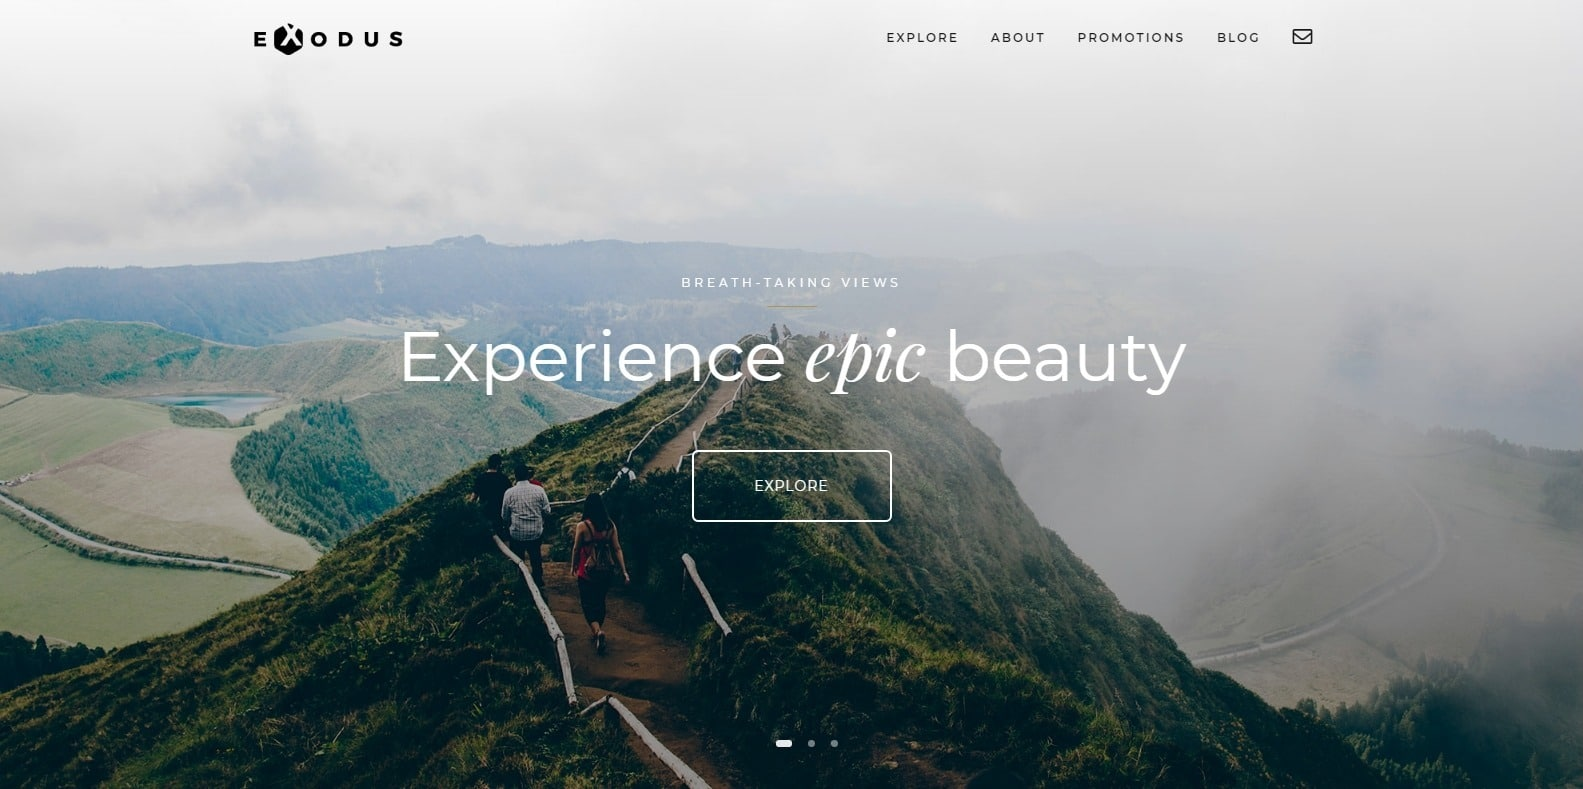 exodus-travel-website-template